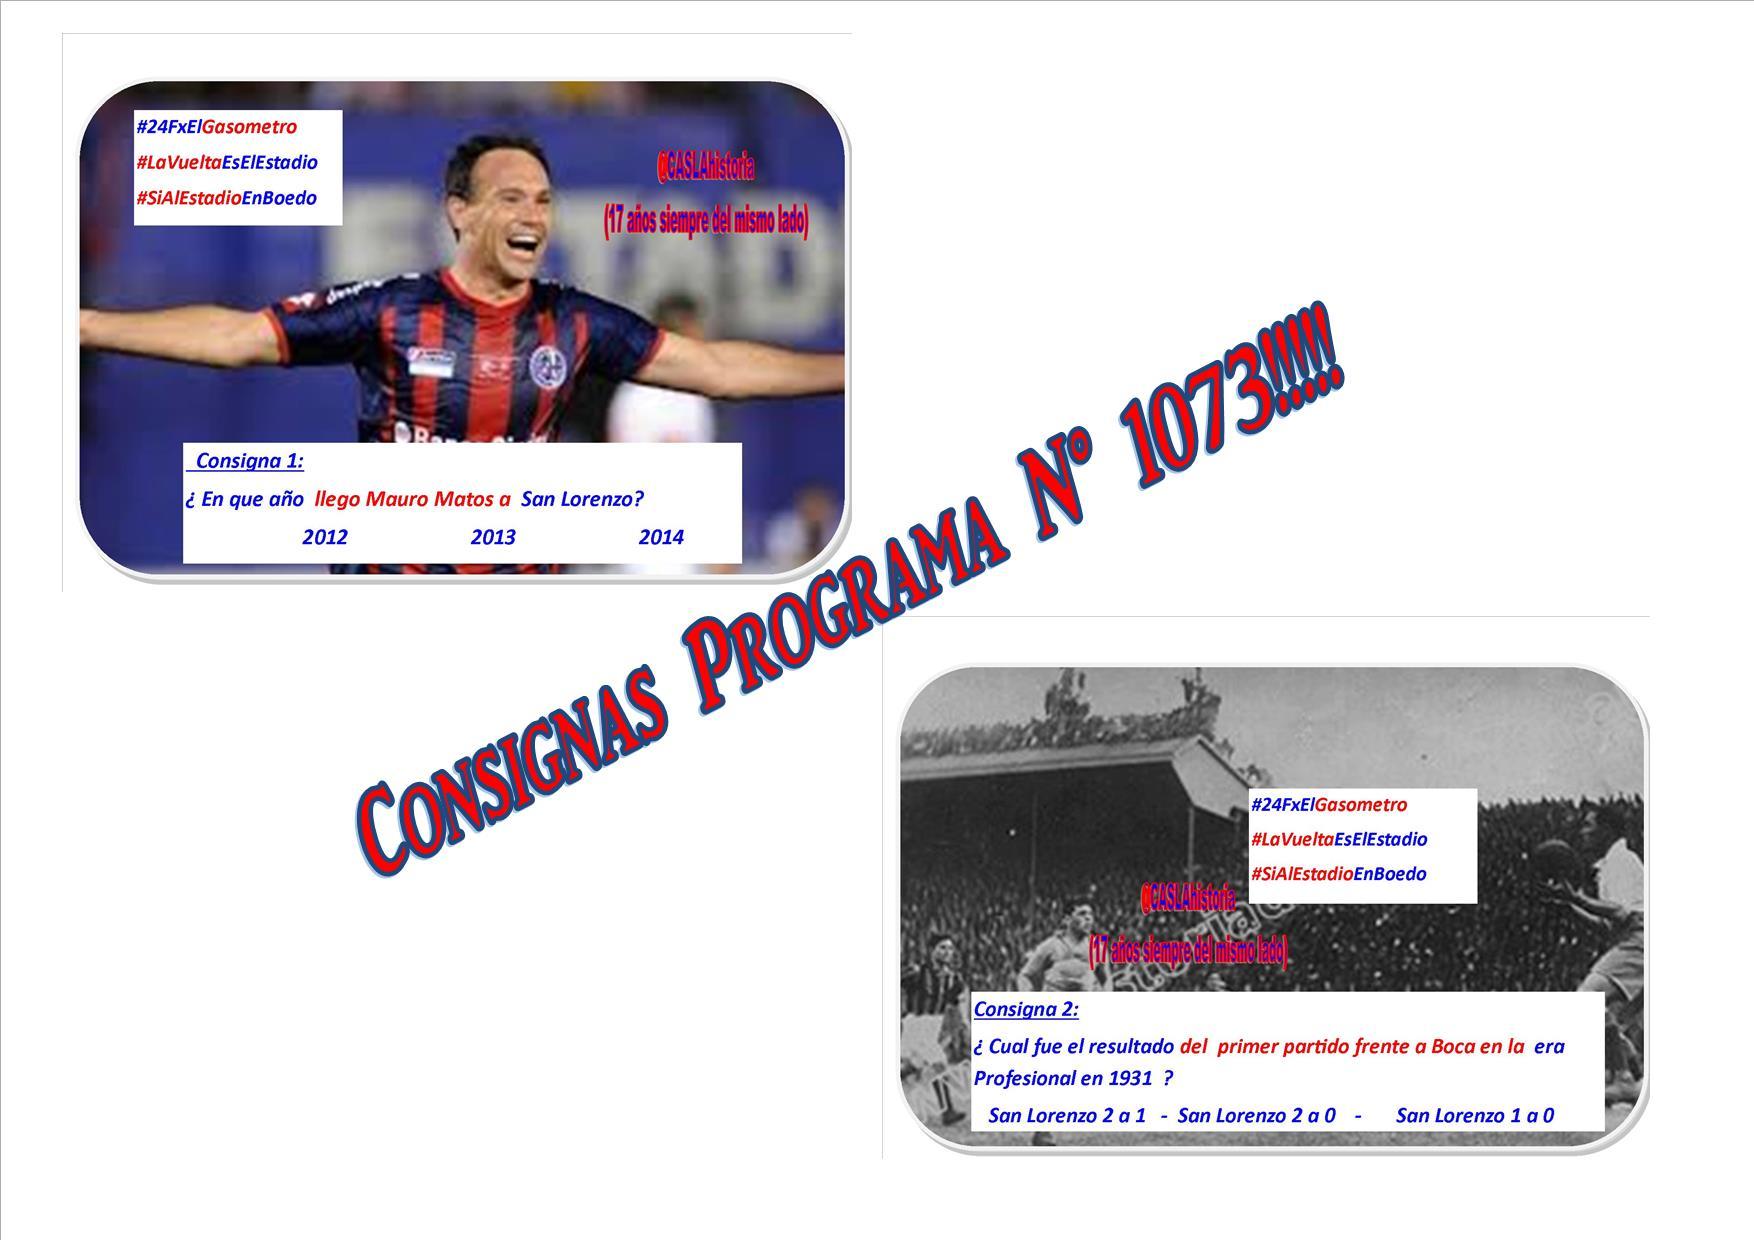 Consignas Programa N° 1073 !!!!!